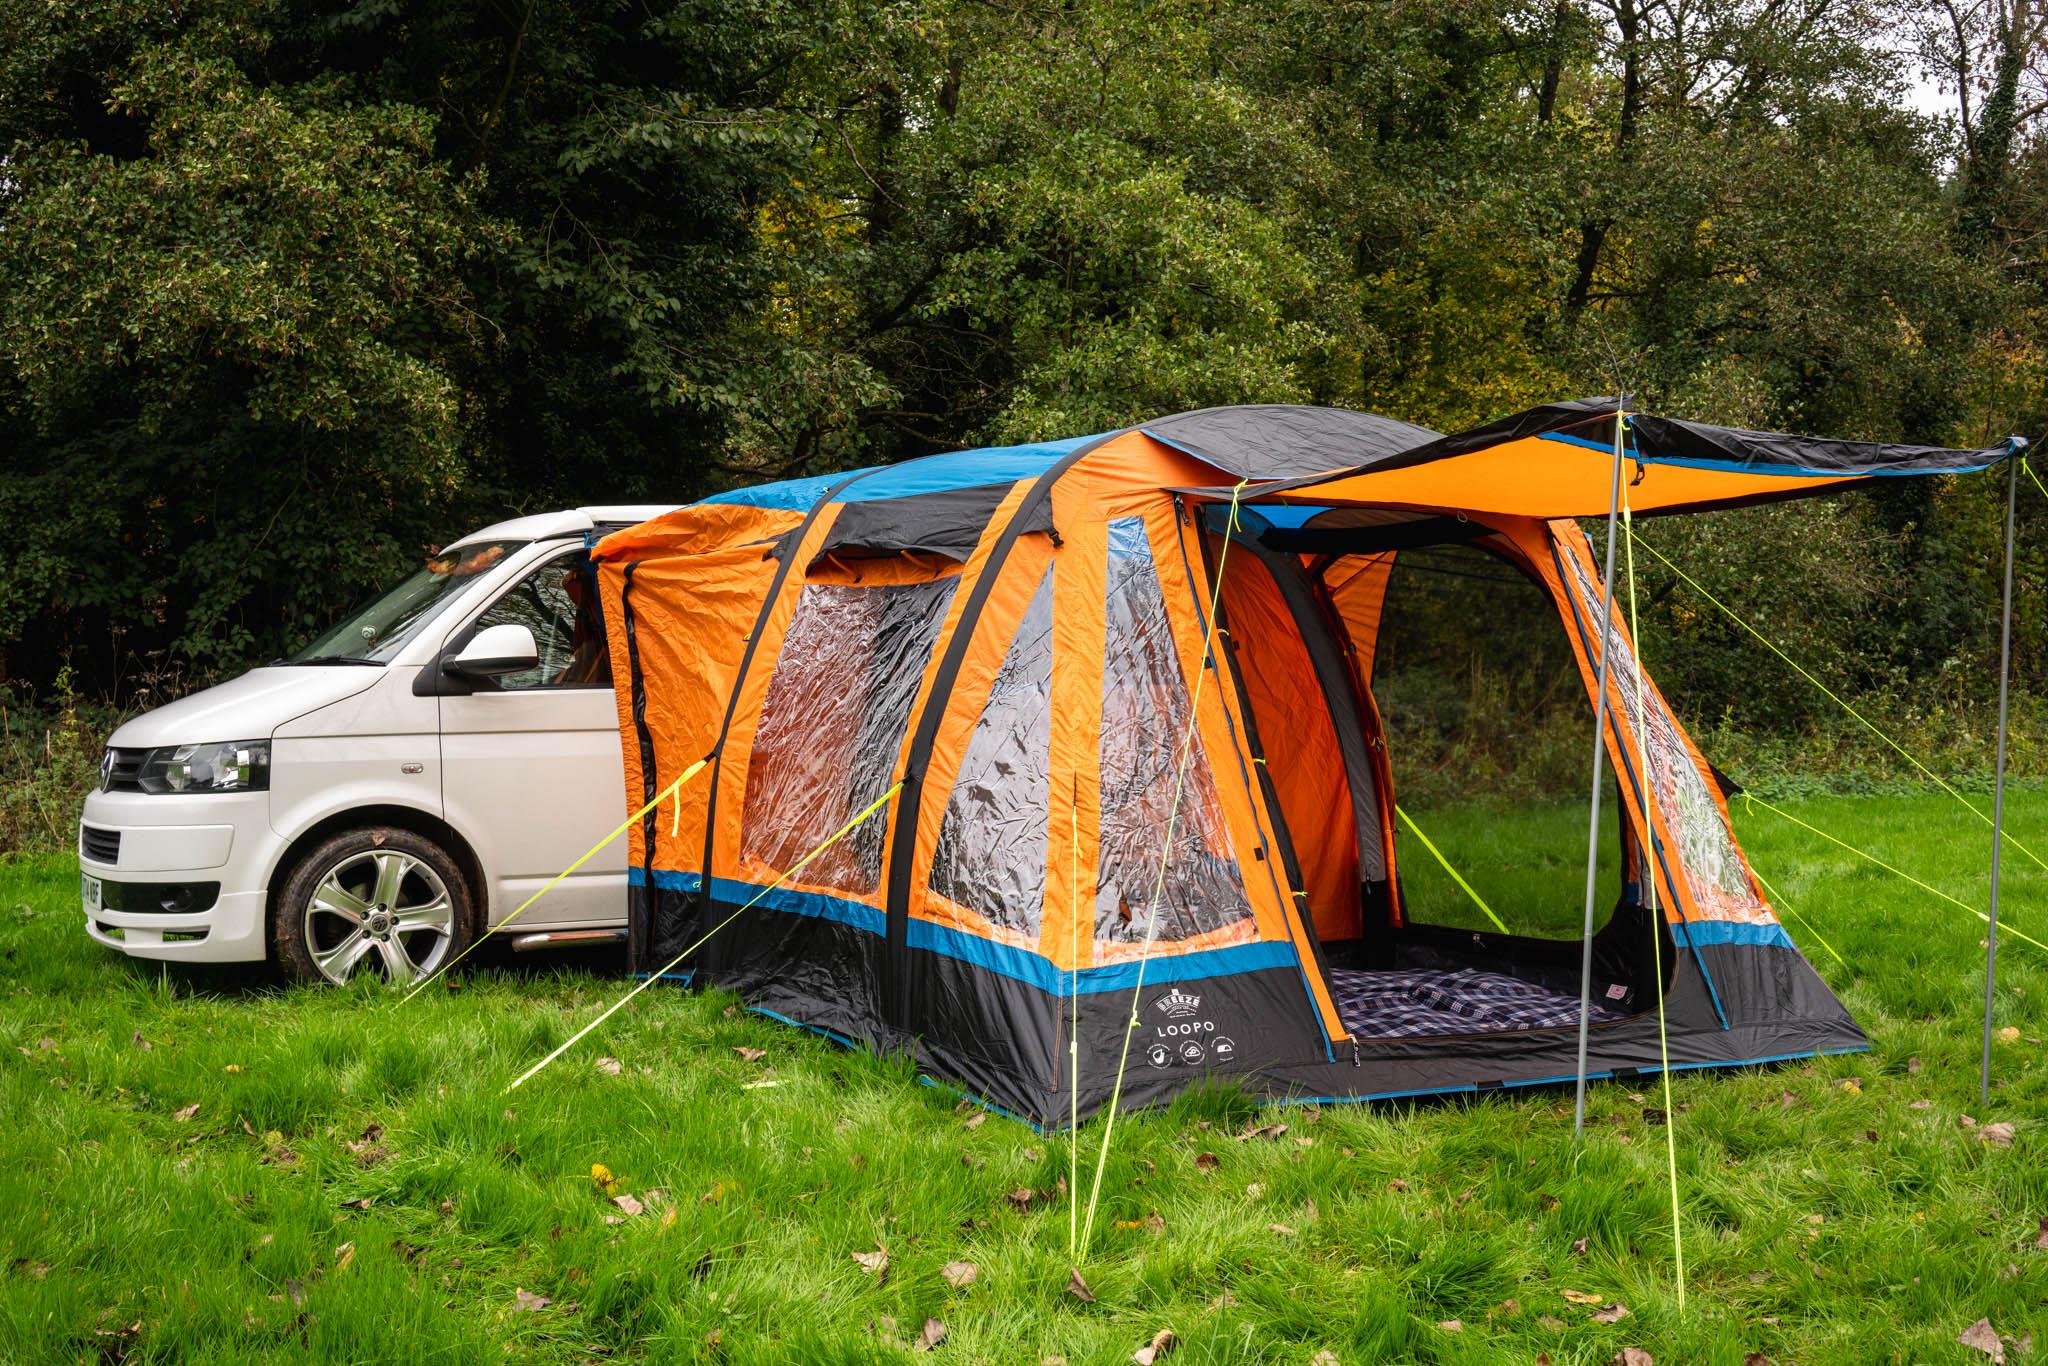 OLPRO Orange Loopo Breeze Campervan Awning